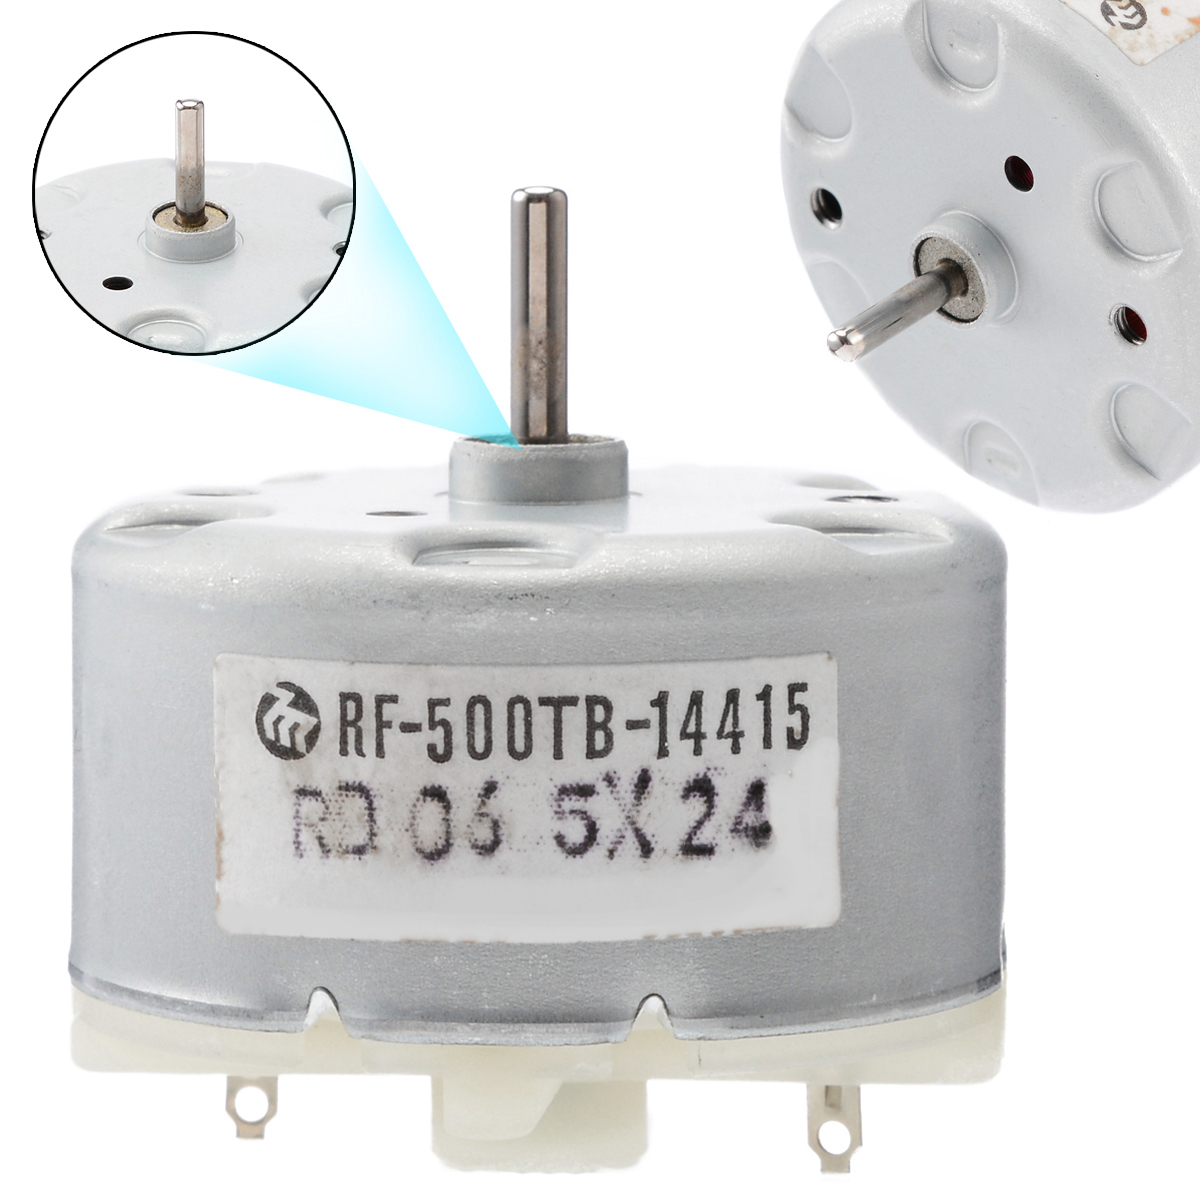 DC 1.5V~6V 8000RPM Mini RF-310 Solar Power Motor 24mm Small Round Toy Motor DIY